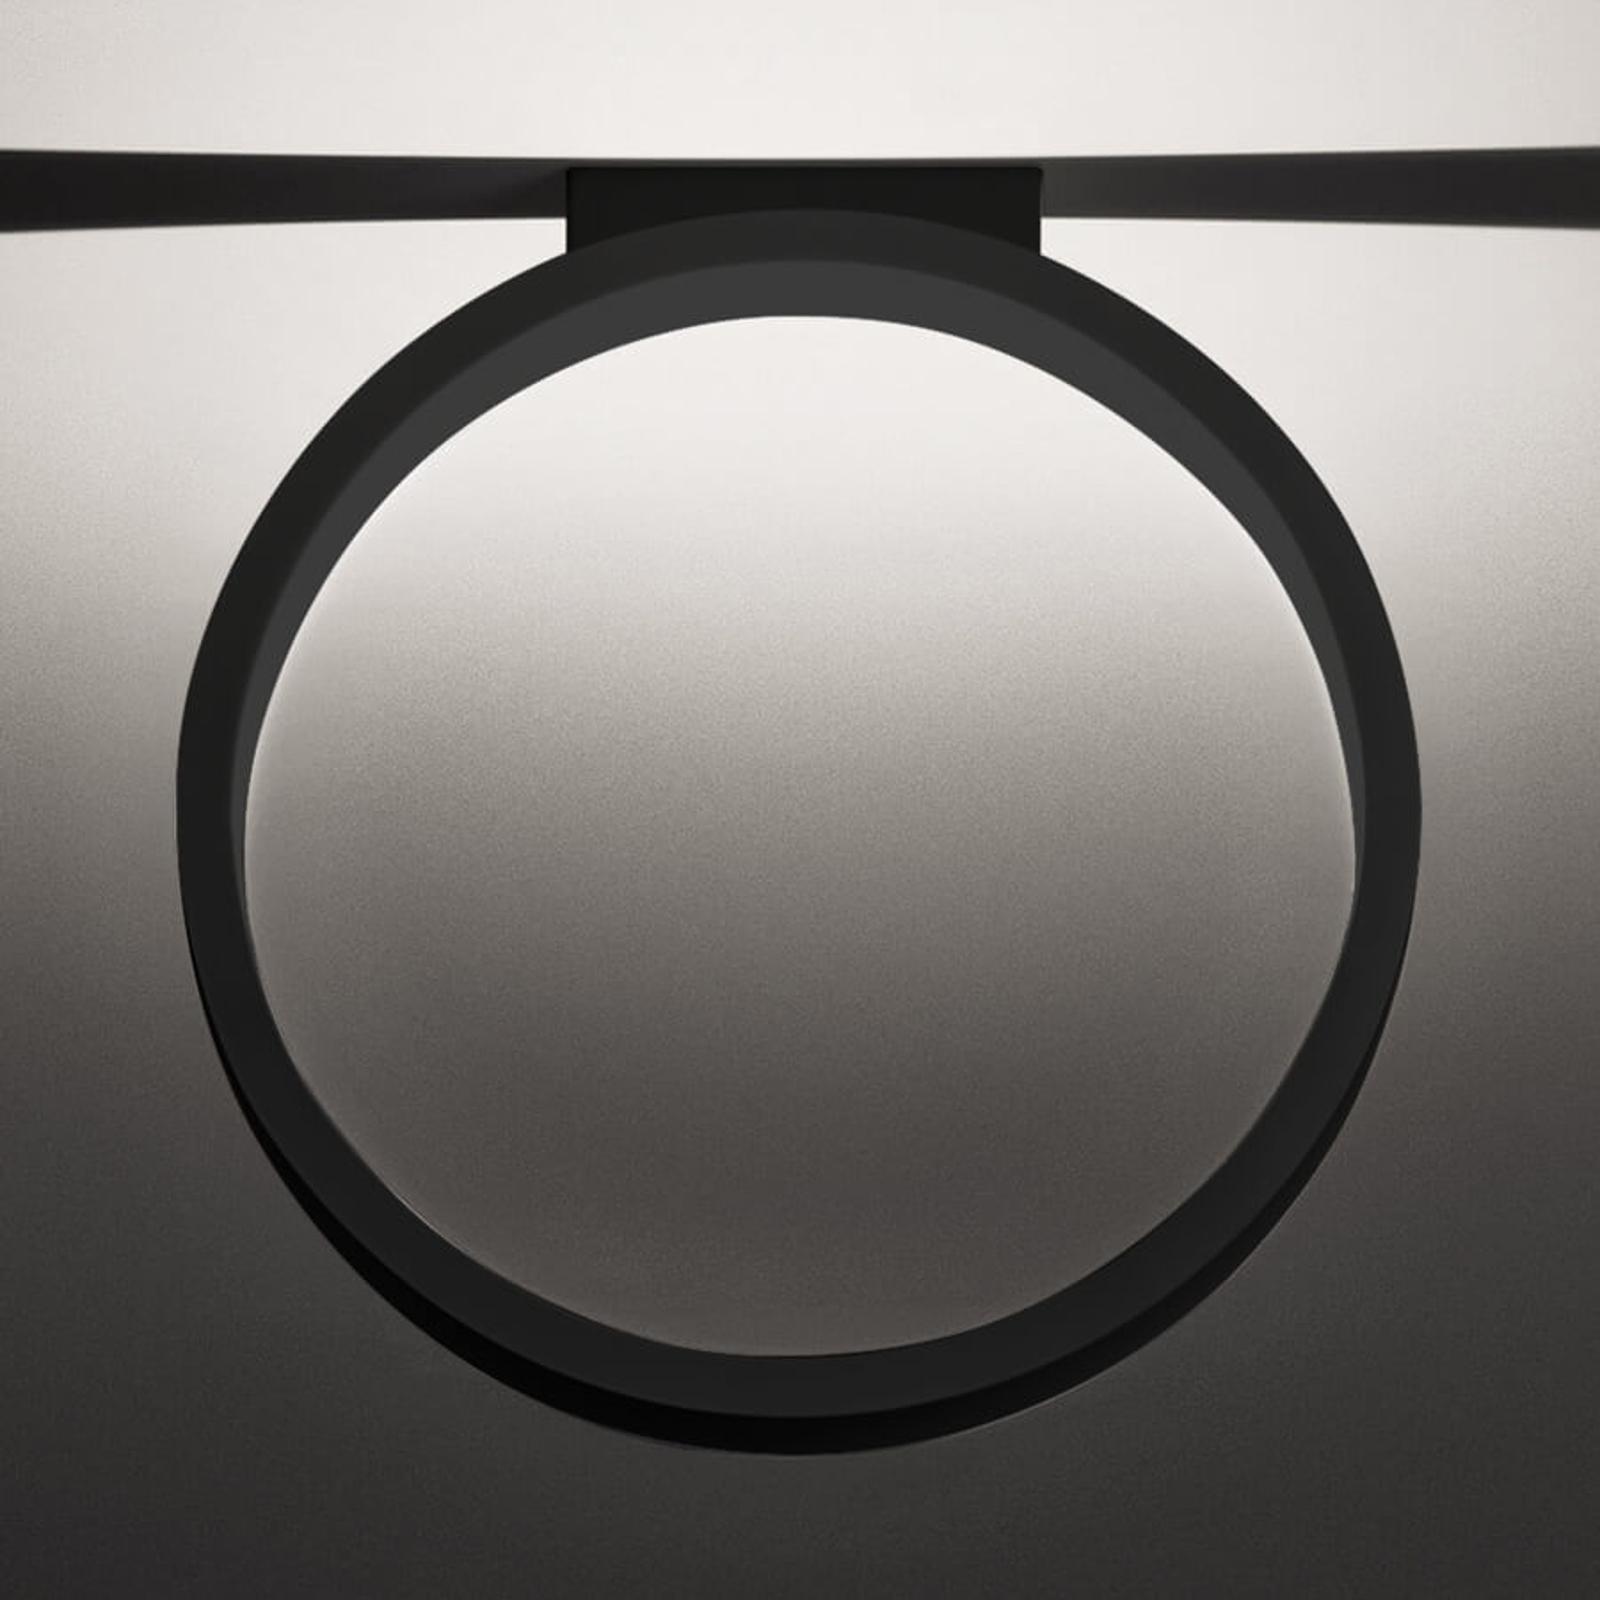 Czarna lampa sufitowa LED Assolo, 43 cm